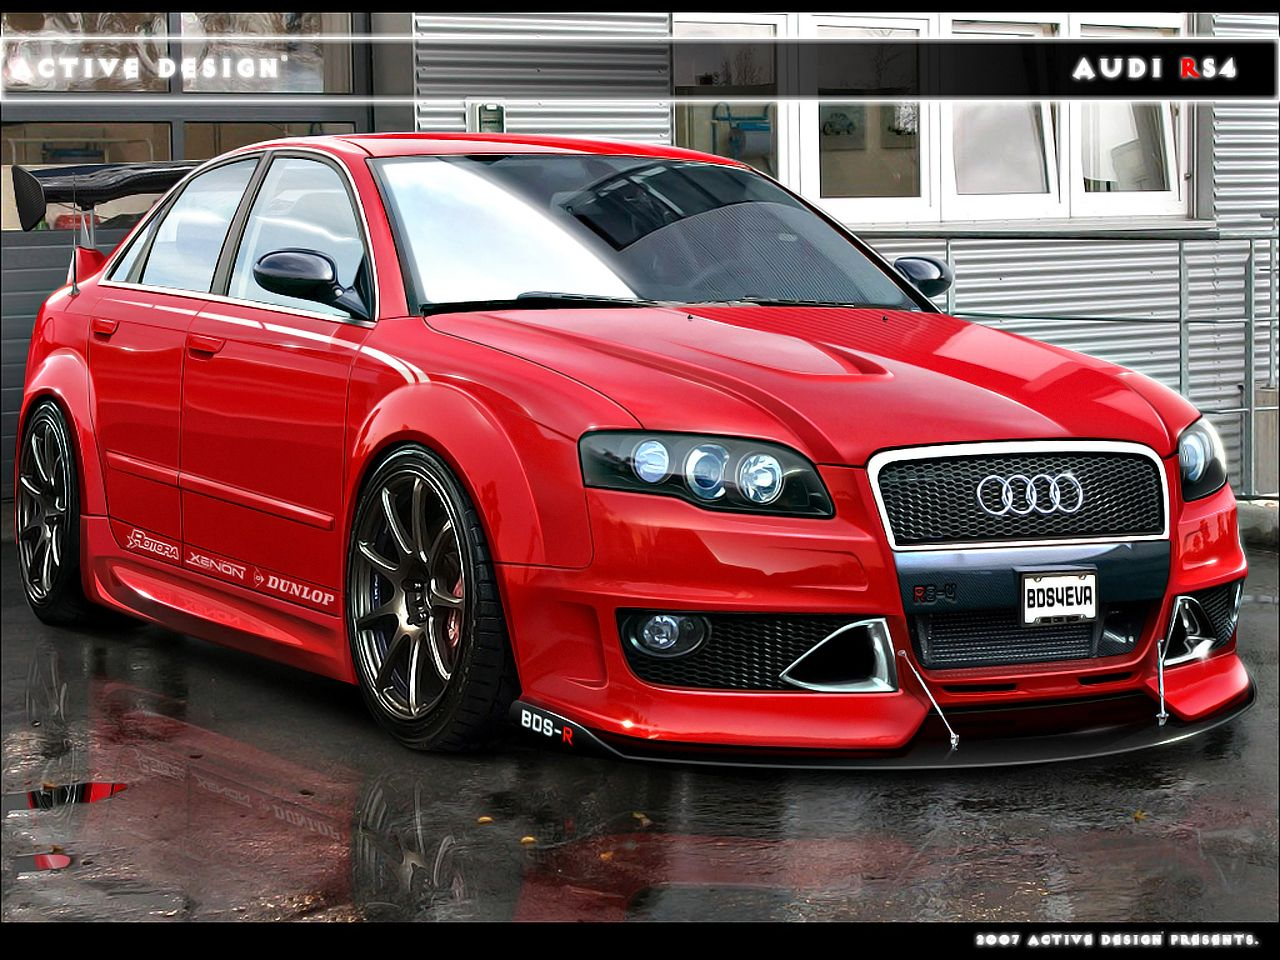 Modified A4 B7 Audi Audi Audi Rs4 Audi Cars